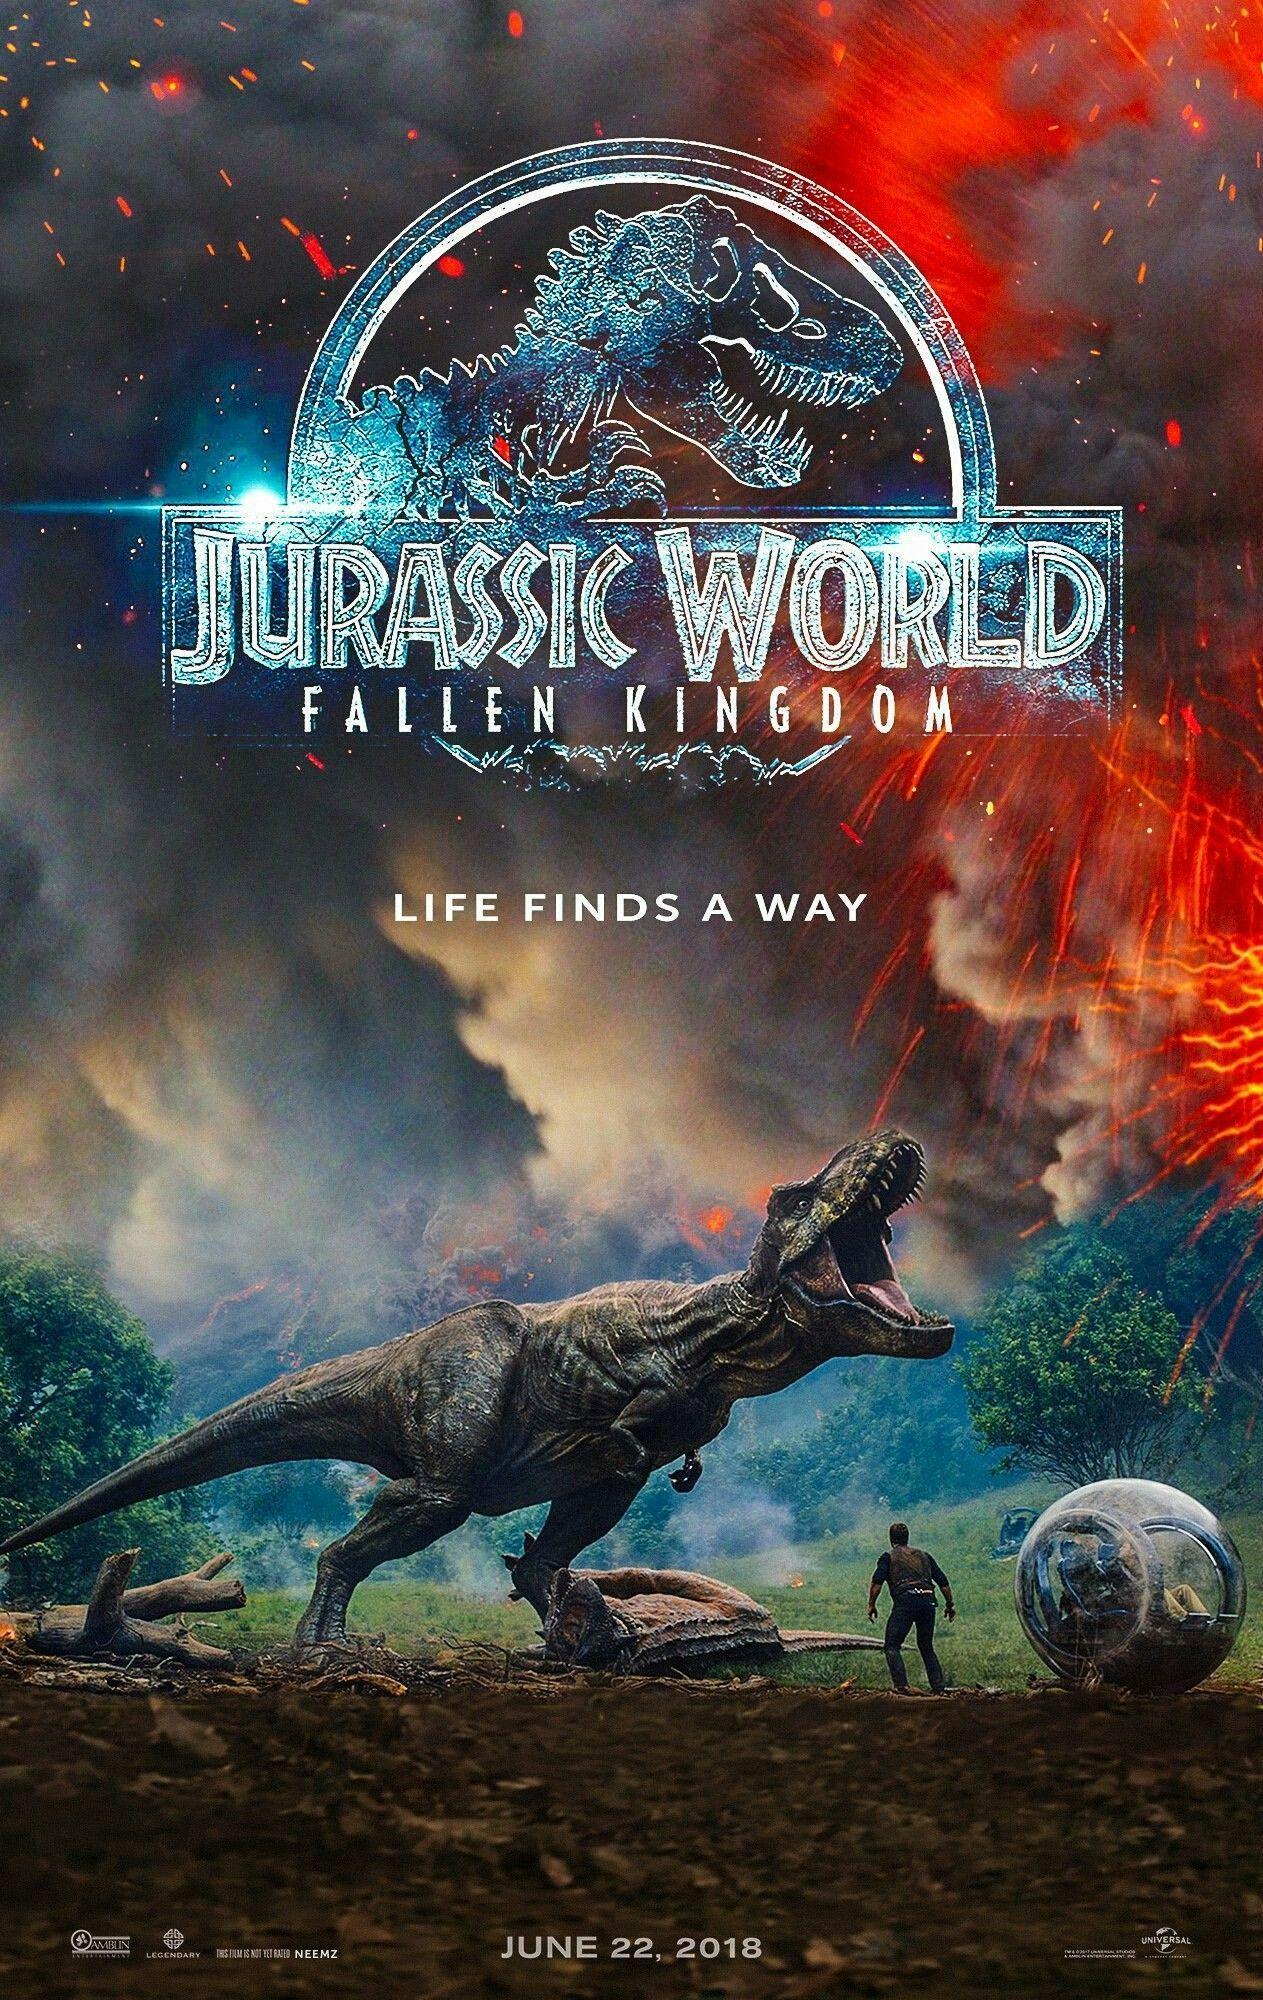 Jurassic World 2 El Reino Caido 2018 Jurassic World Pelicula Completa Jurassic World Peliculas De Terror